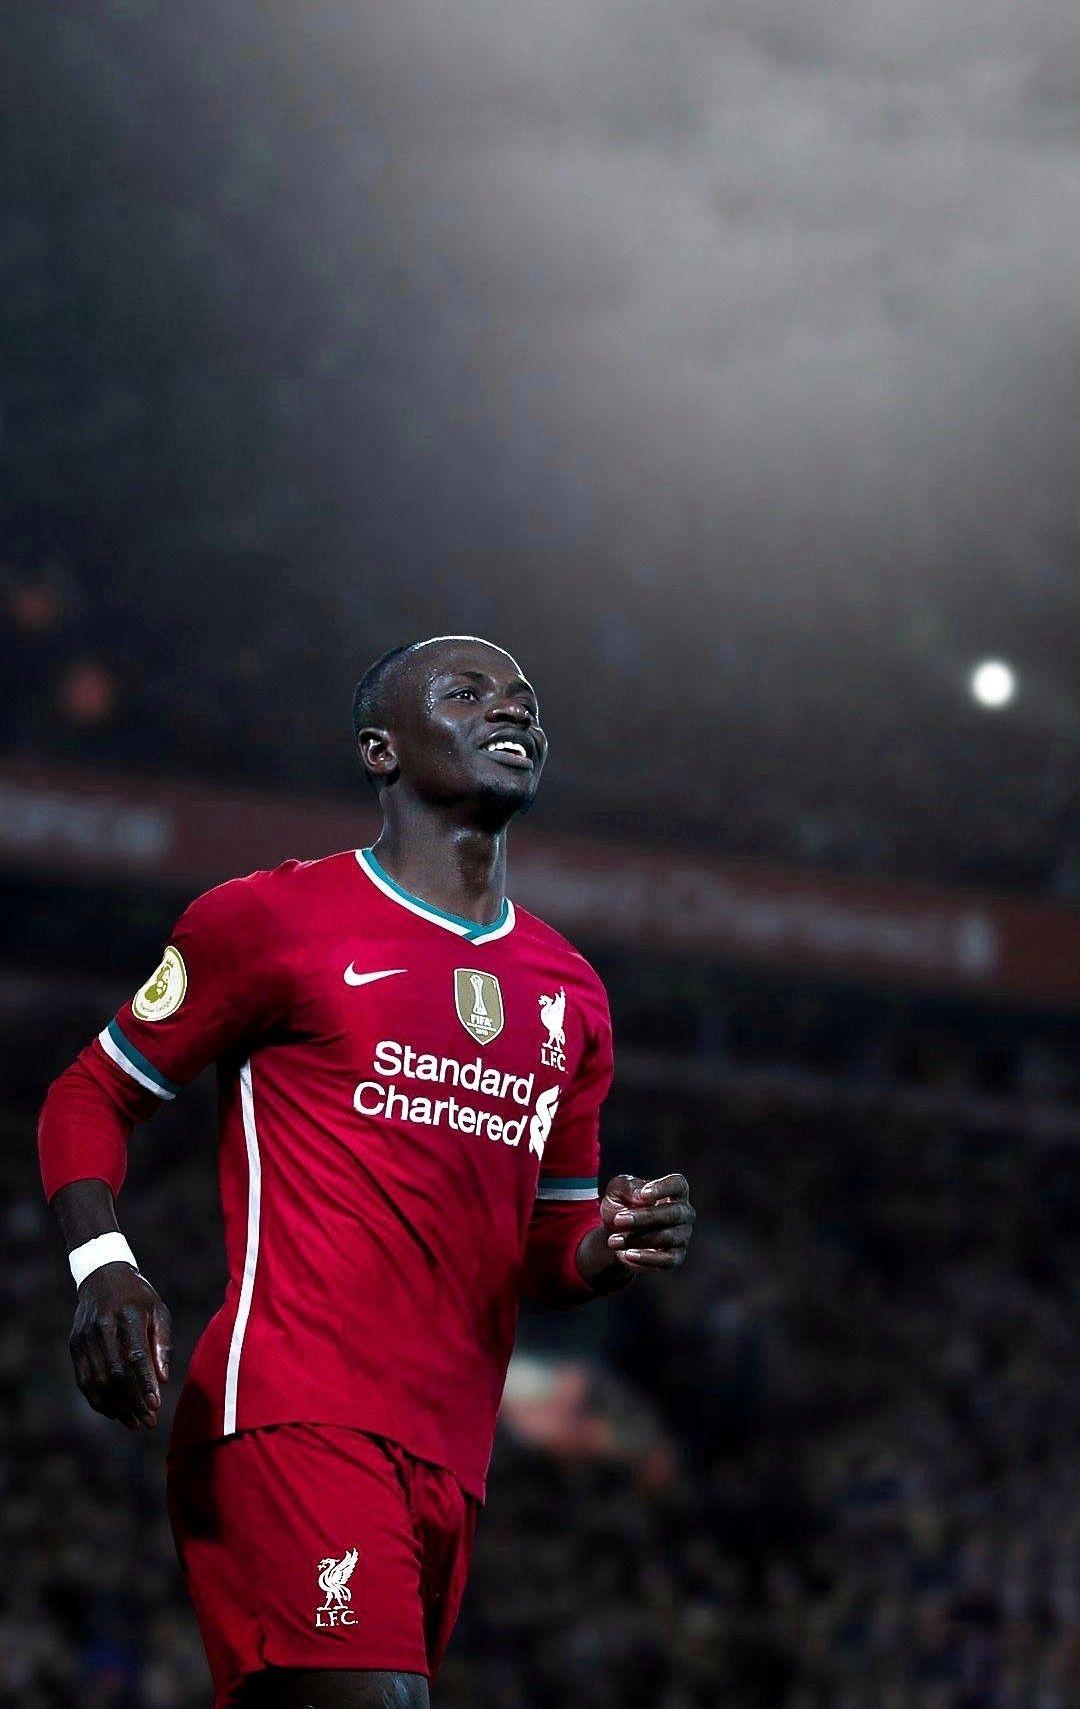 Nike X Liverpool X Mané di 2020